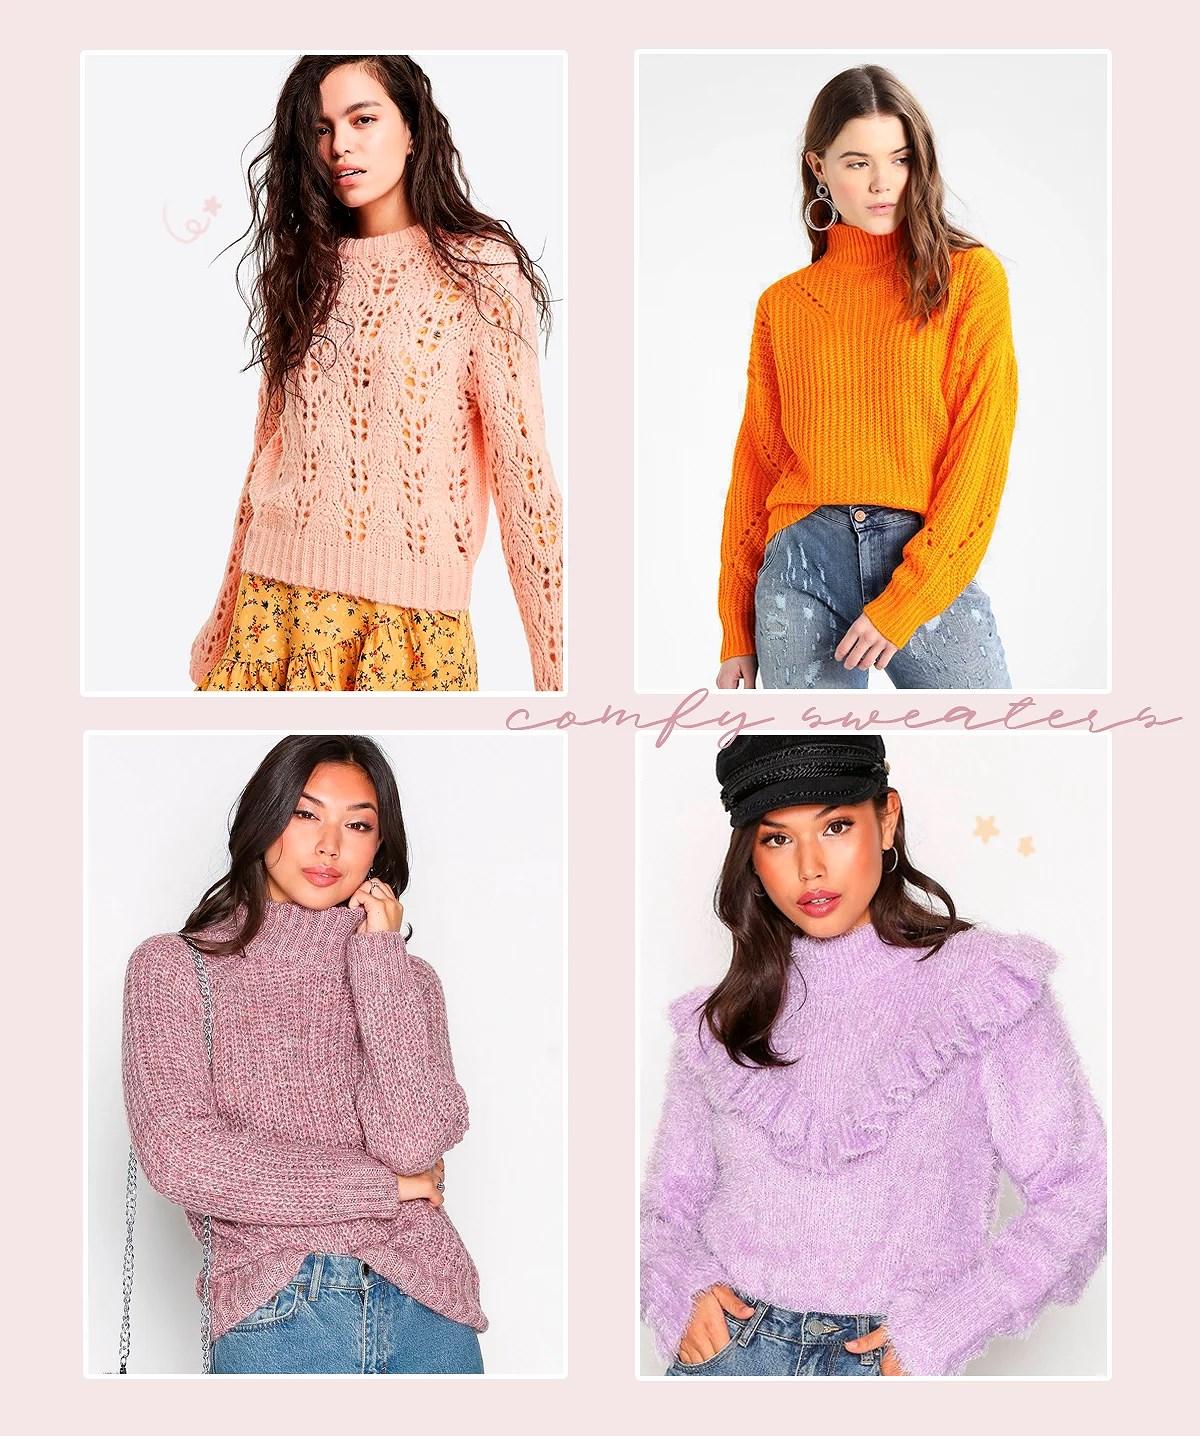 4 warm sweaters